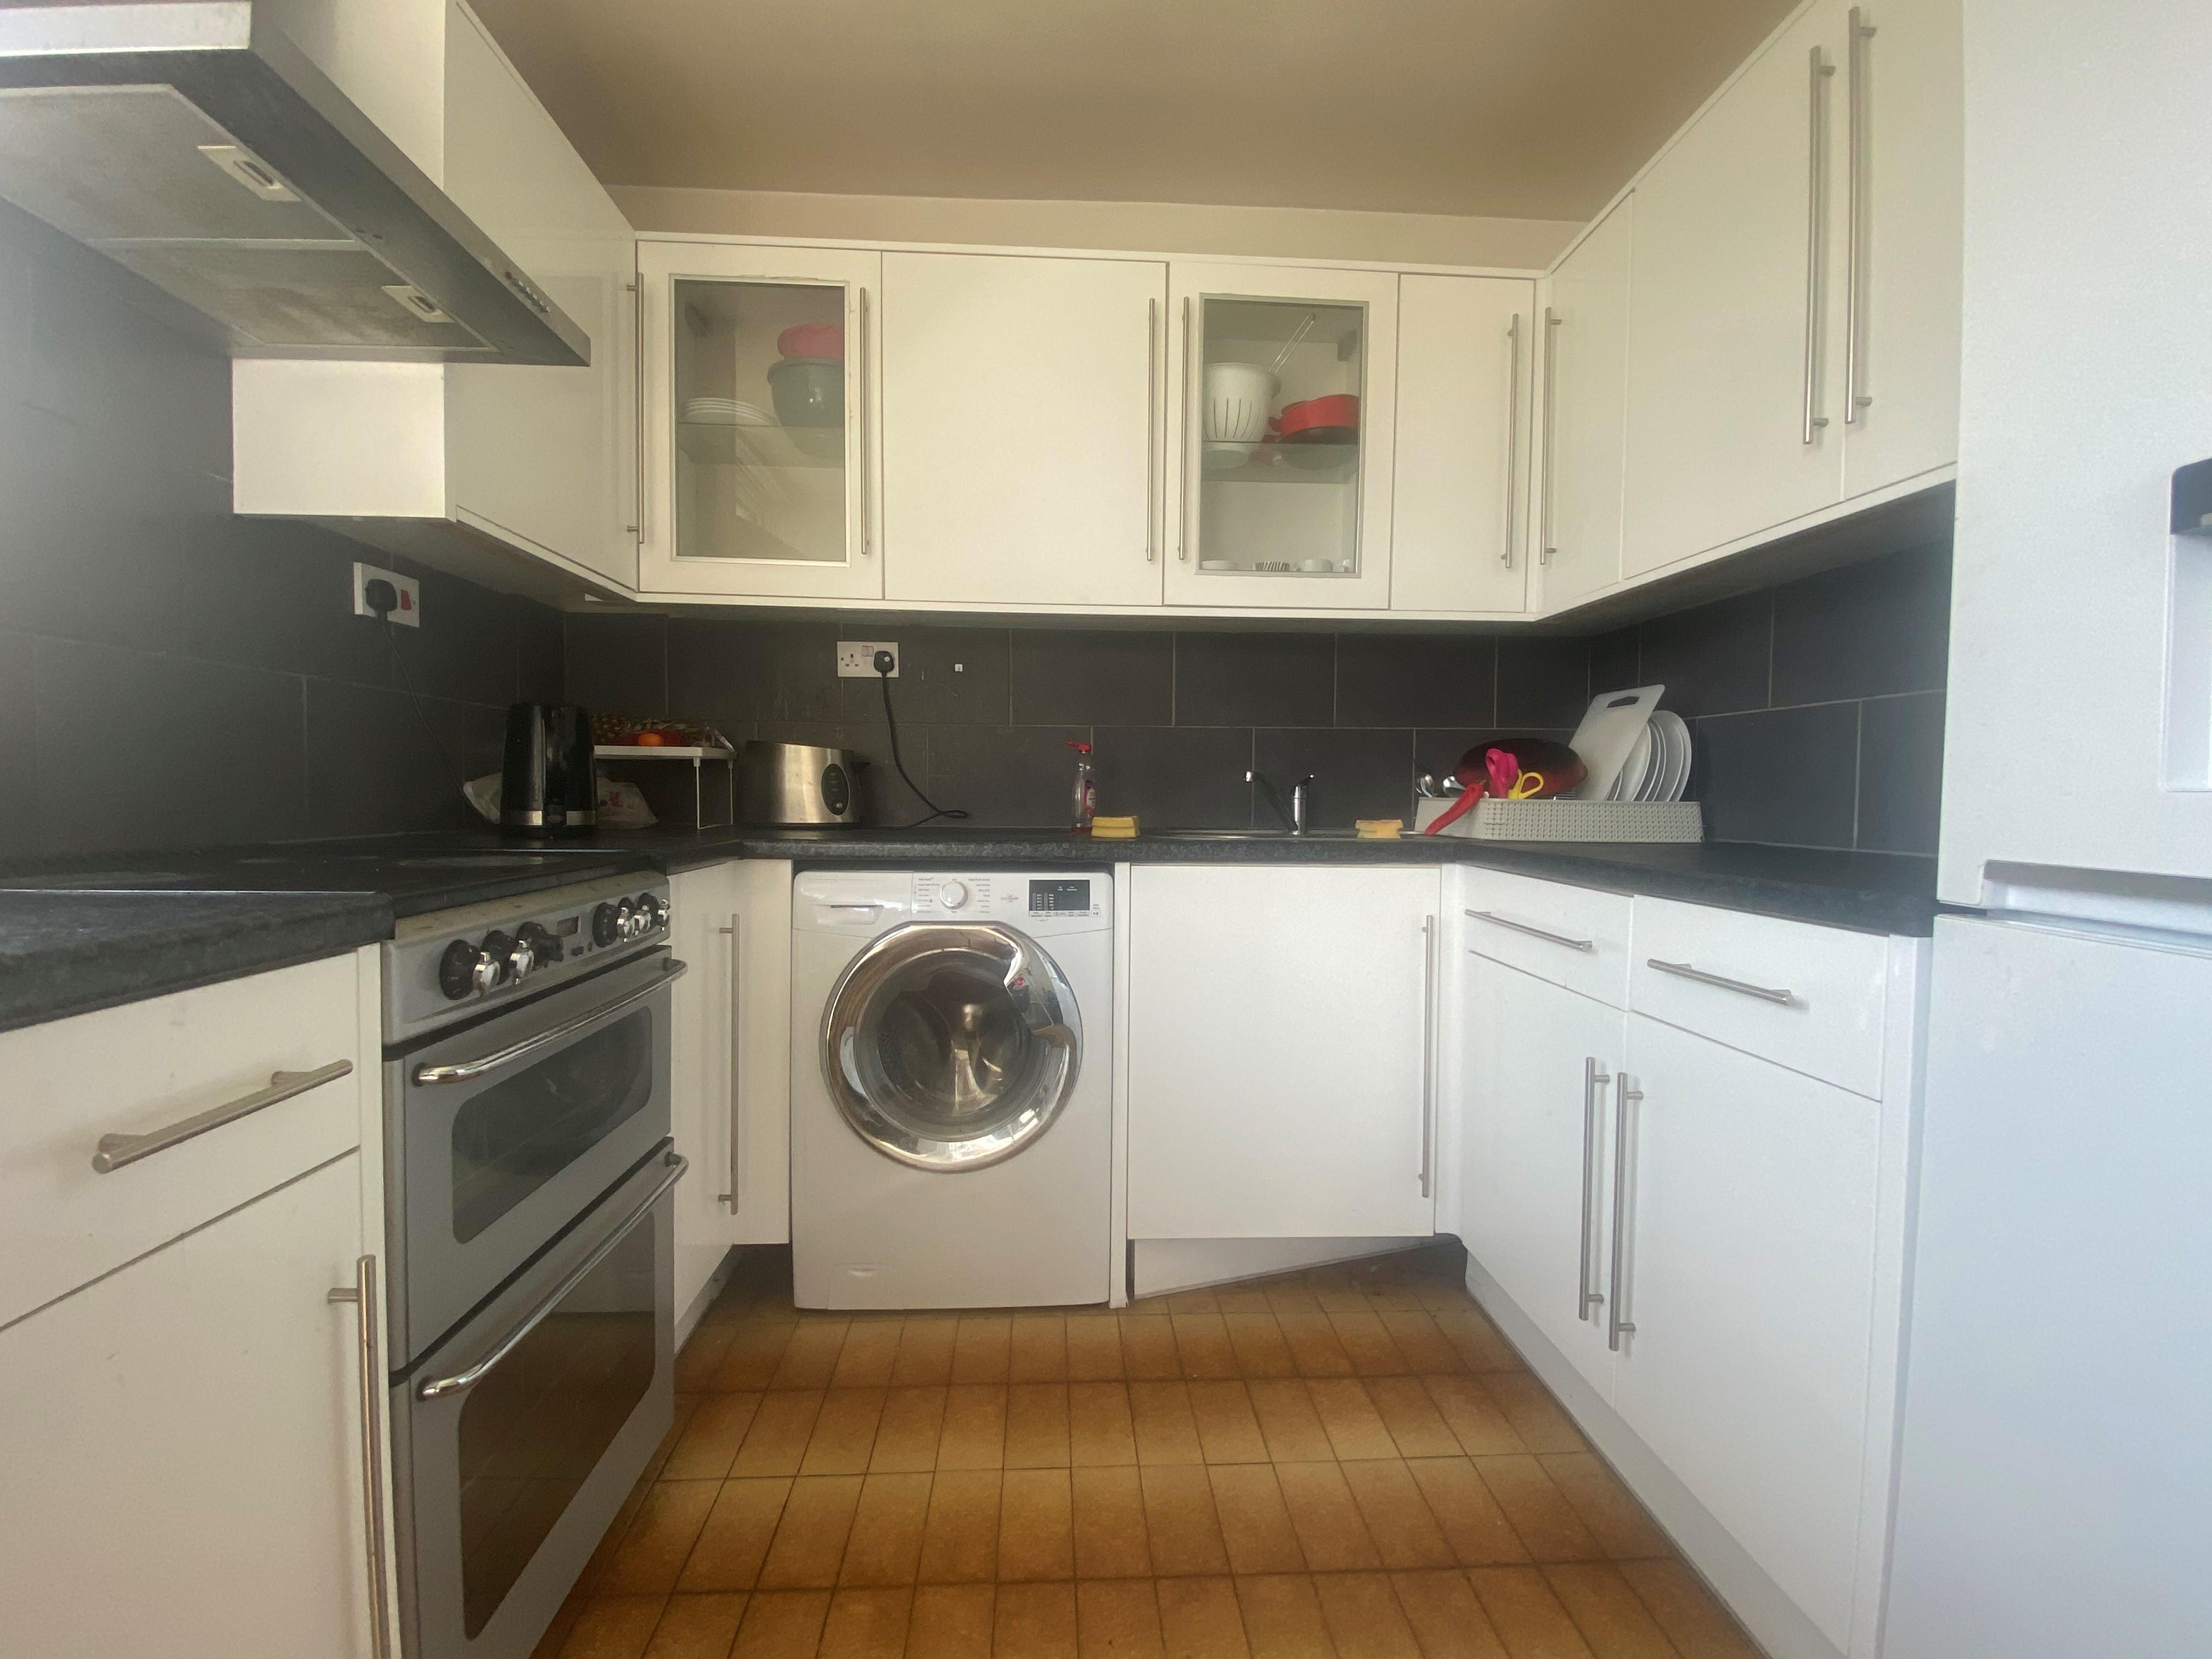 customer_1/branch_1/client_46455/sale_property/kitchen_1629460960.jpeg